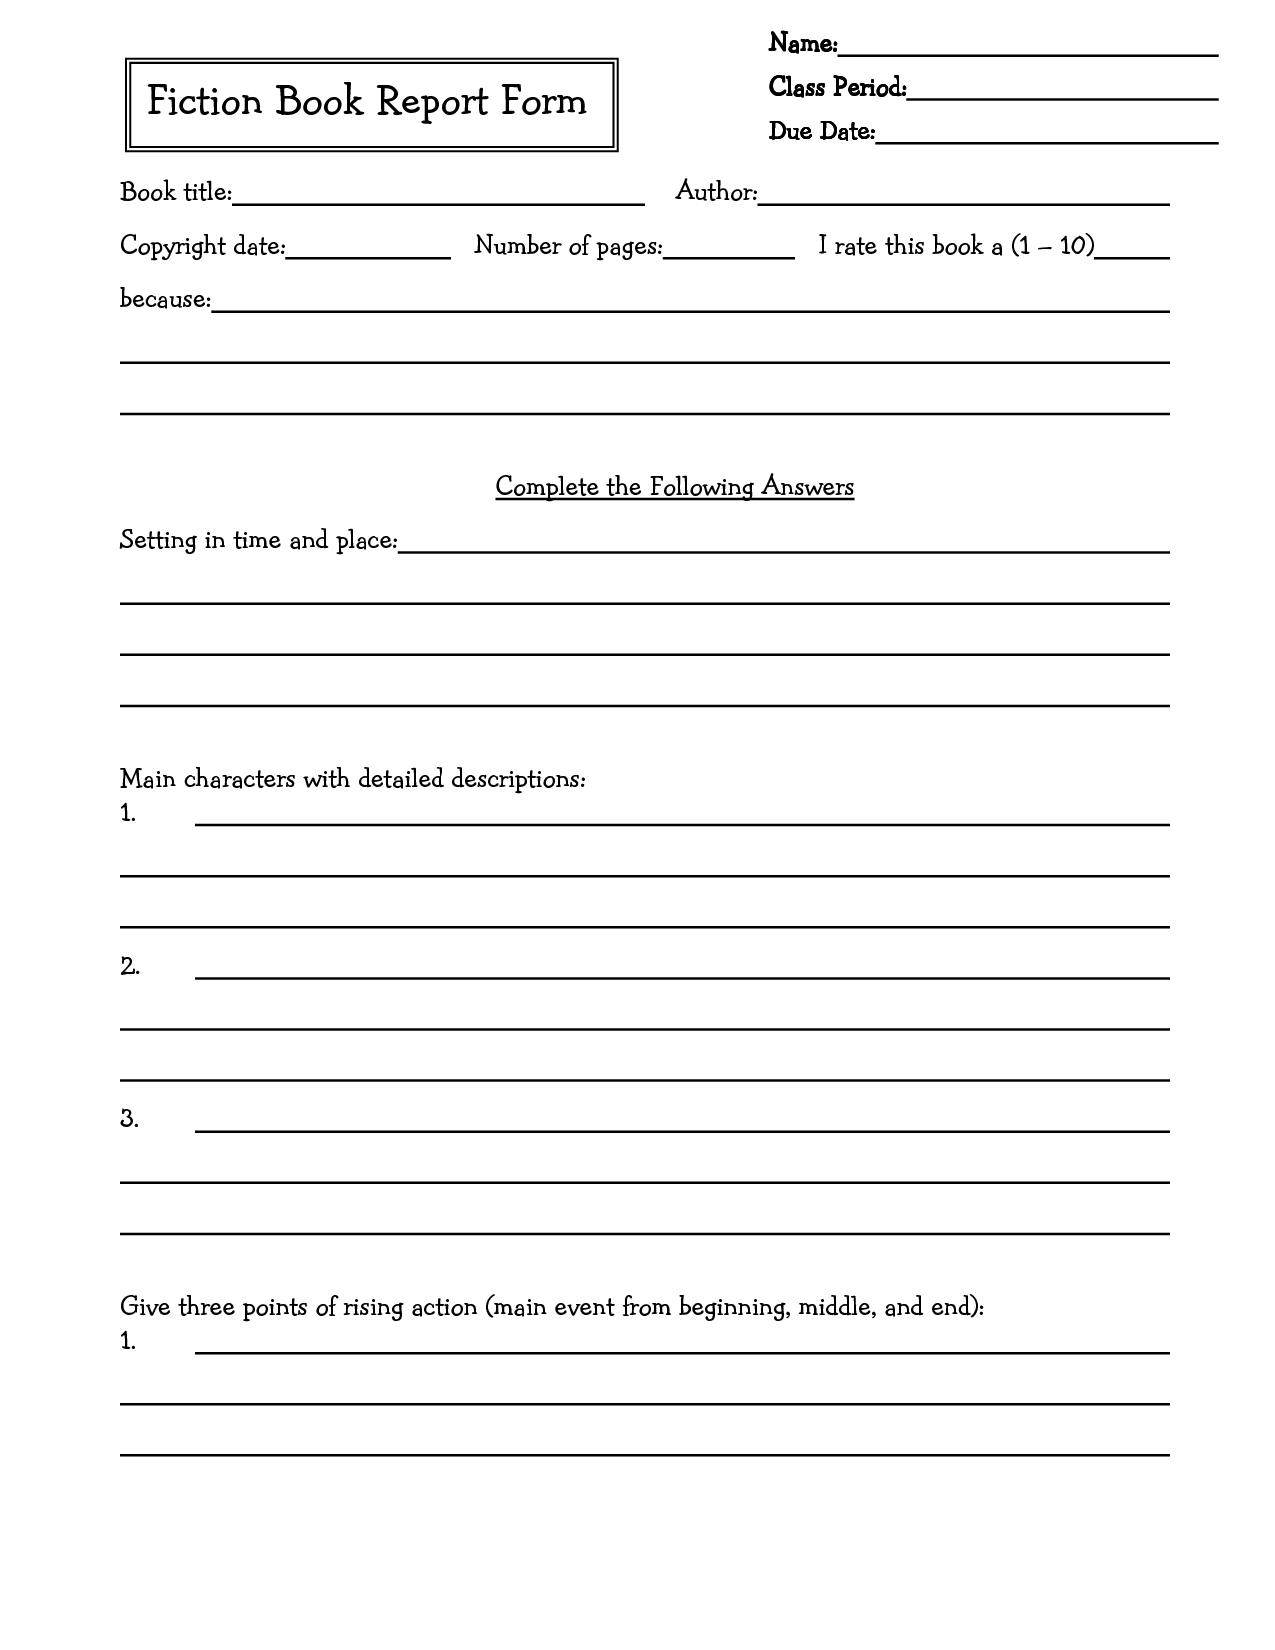 Middle School Book Report Brochure. 6Th Grade | 7Th Grade throughout 6Th Grade Book Report Template